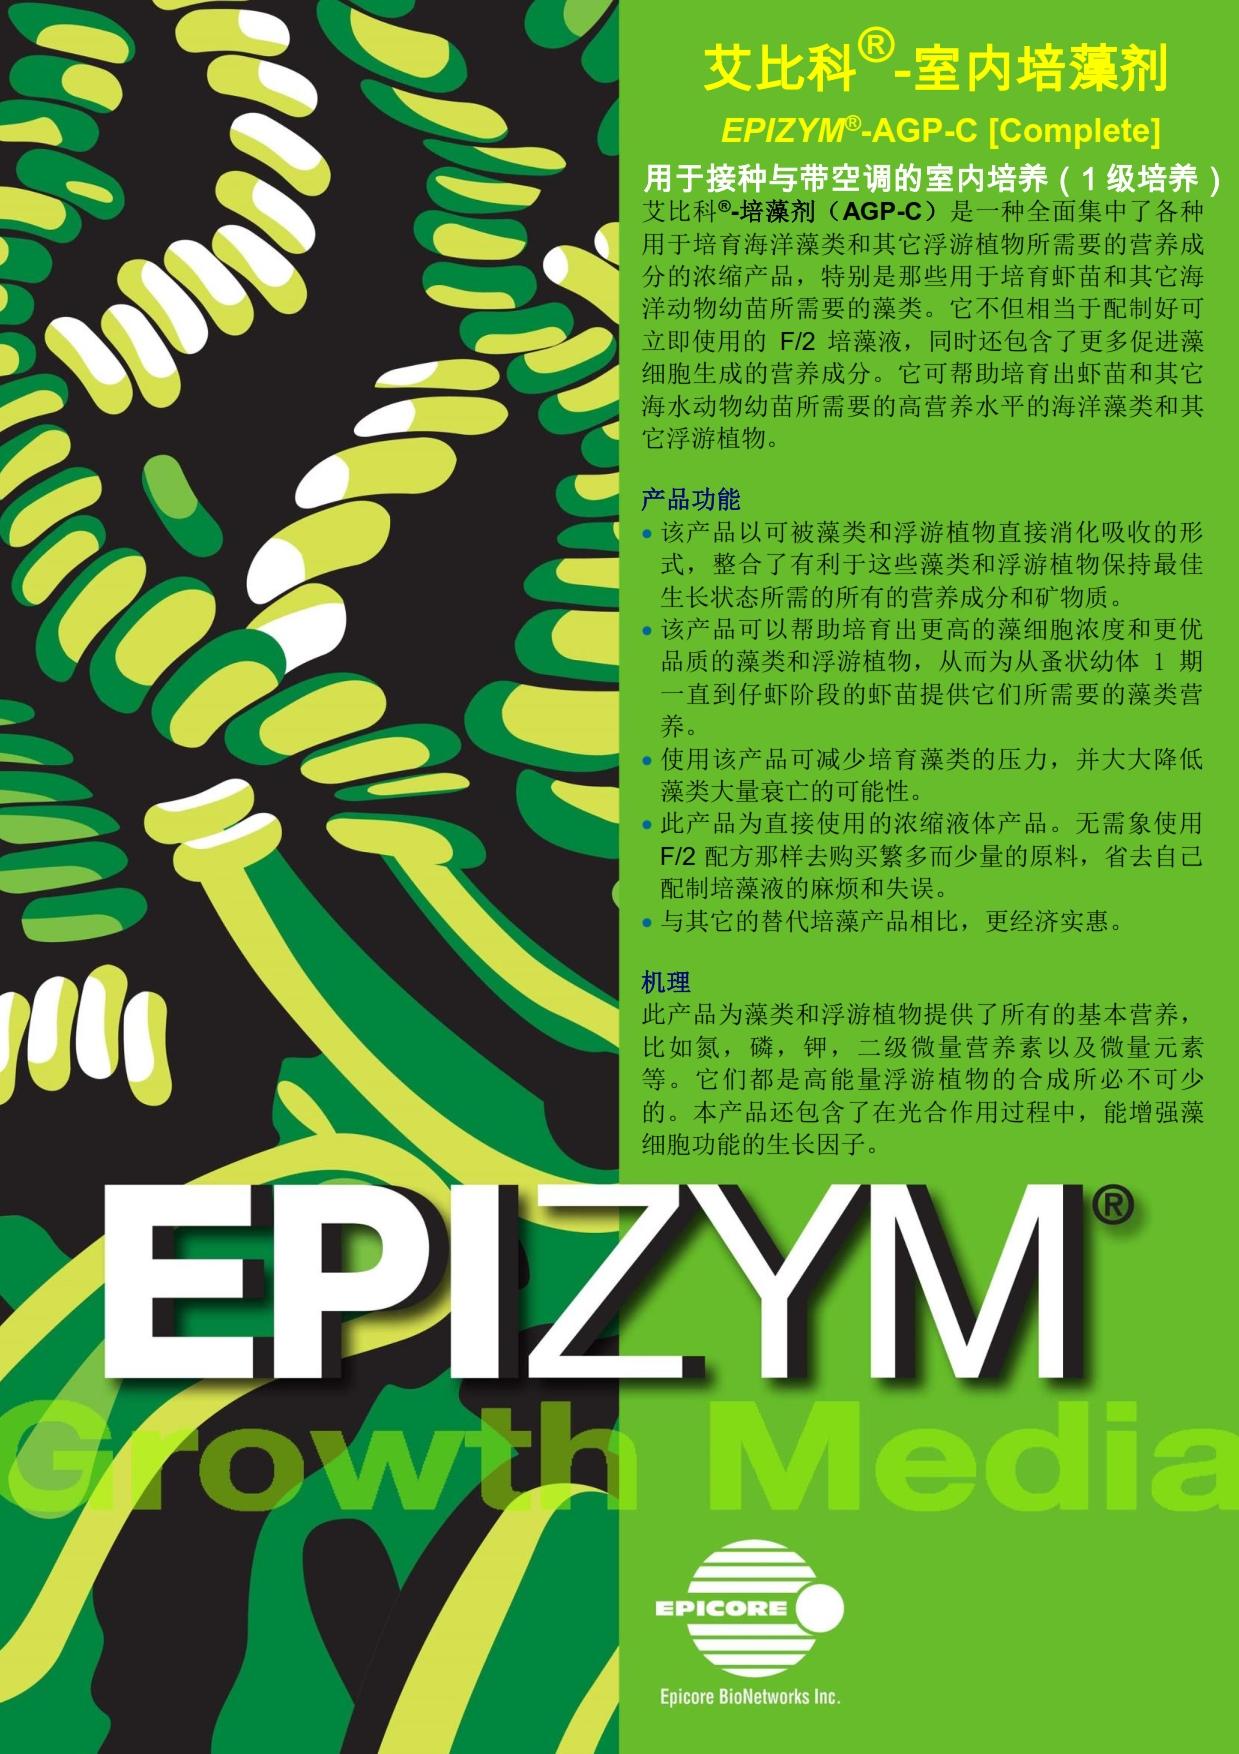 EPIZYM-AGP-C-2014-cn1-V3-web_001